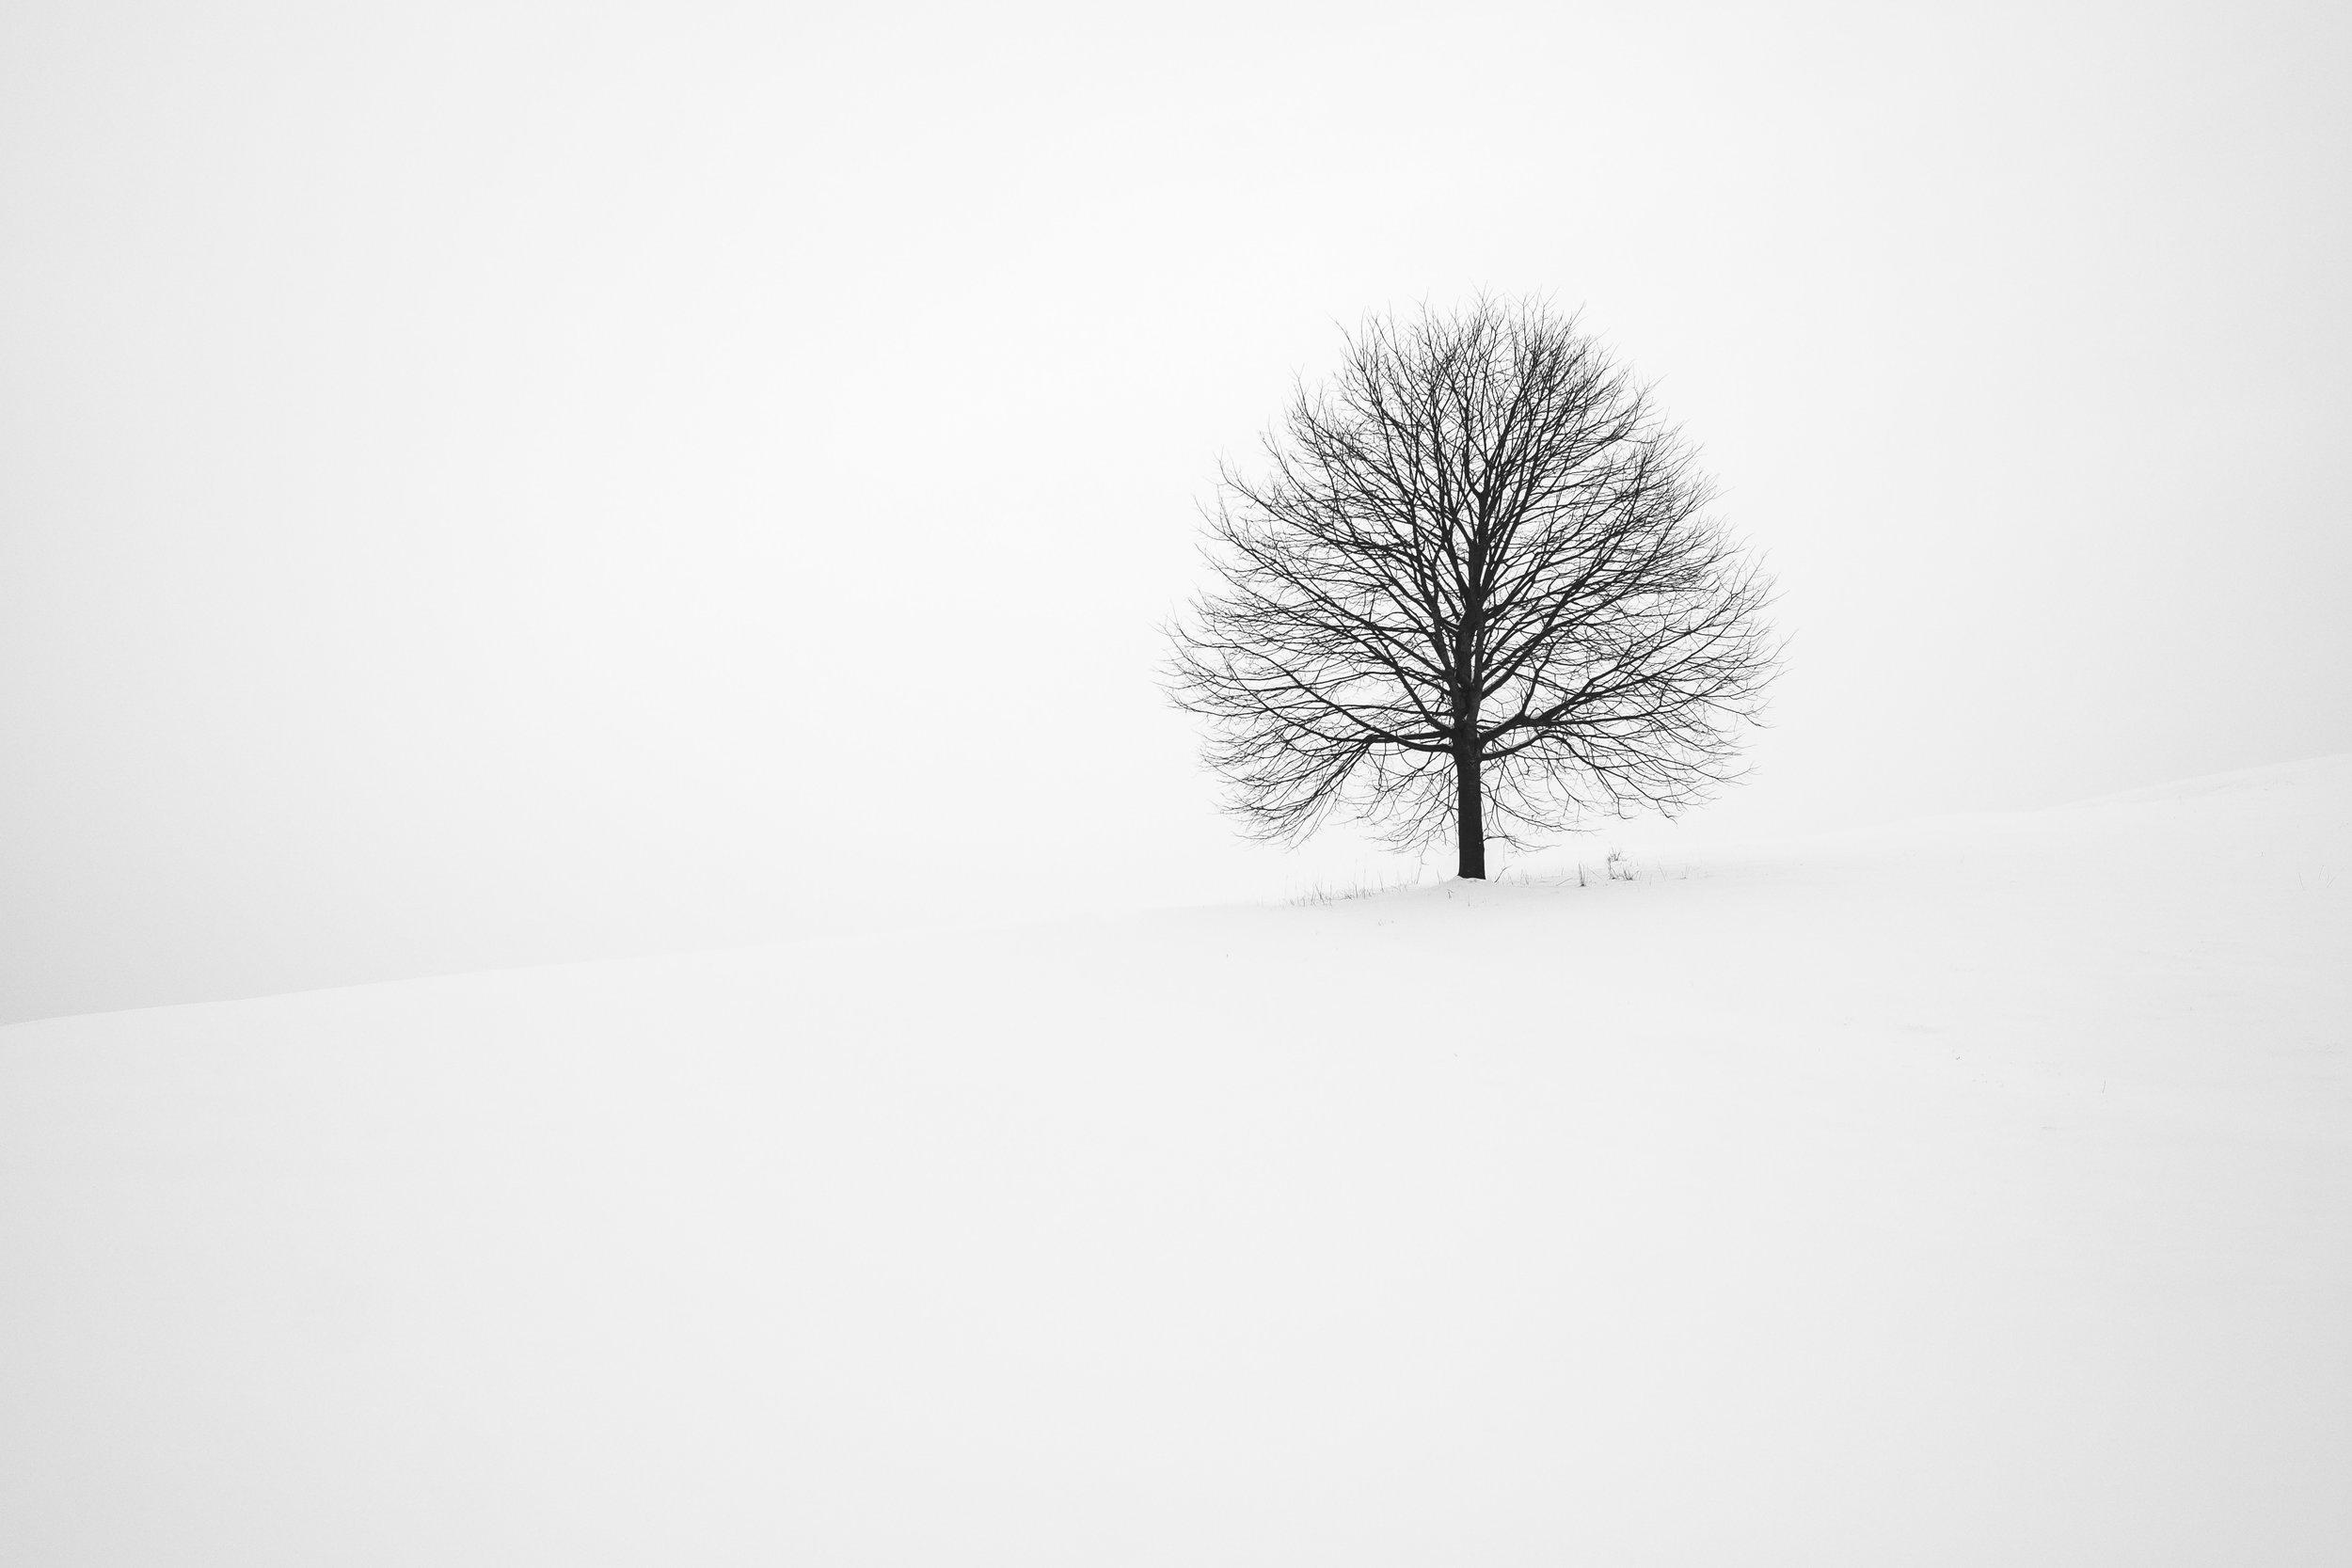 Photo by  Fabrice Villard  on  Unsplash